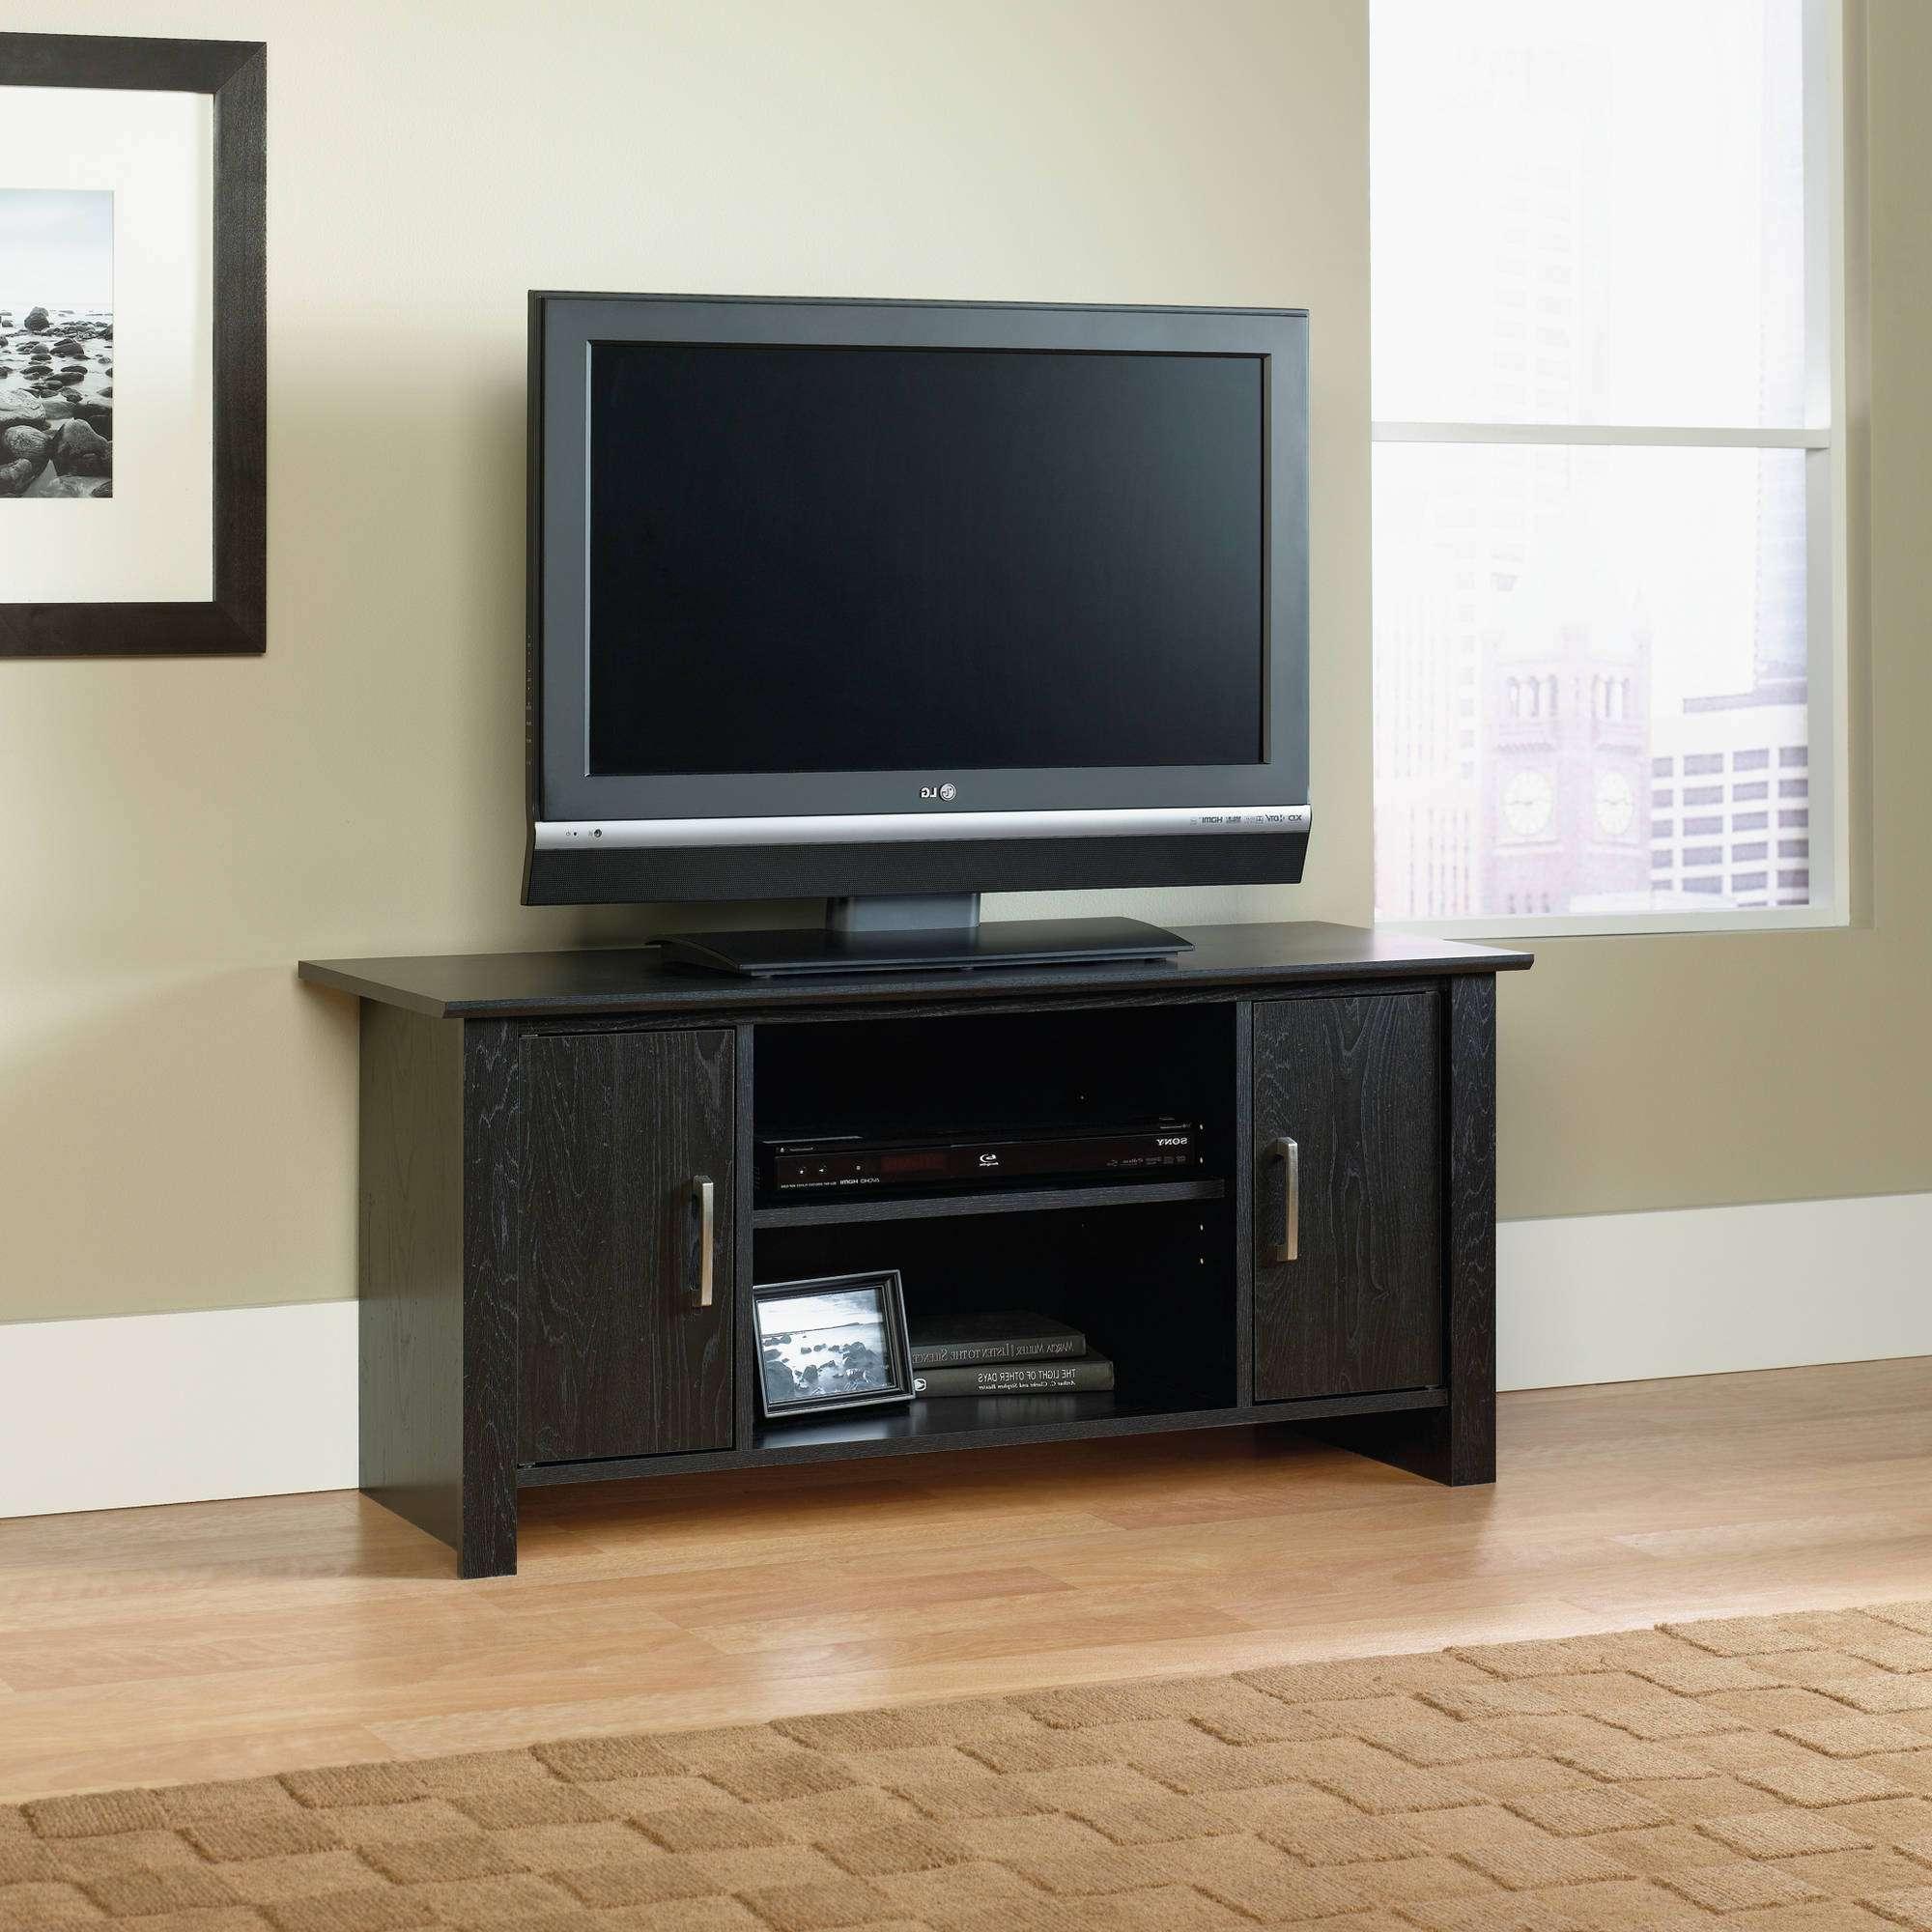 Oak Tv Stands For Flat Screen Inside Oak Tv Cabinets For Flat Screens (Gallery 7 of 20)